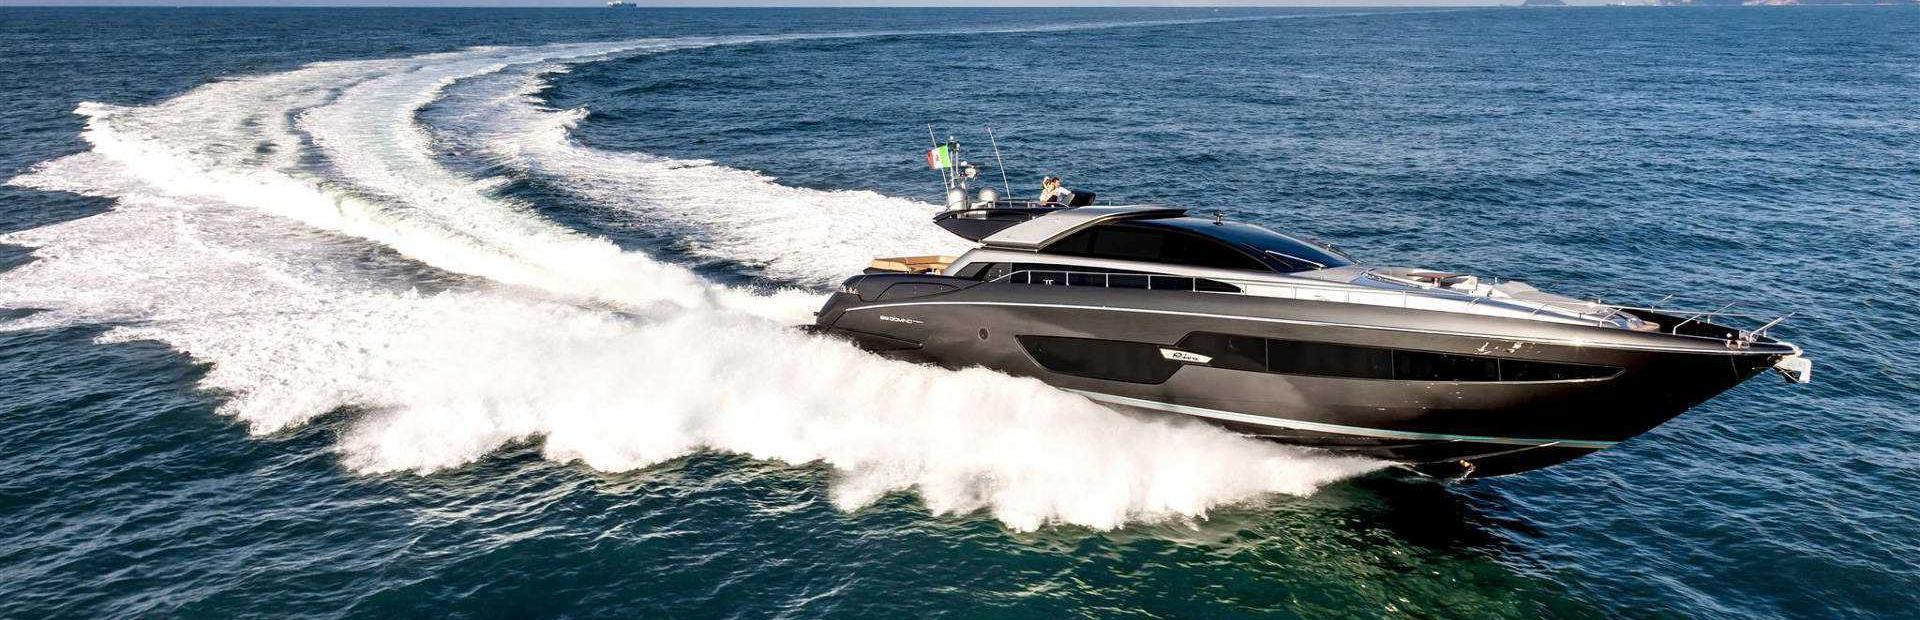 Riva 88' Domino Super Yacht Charter